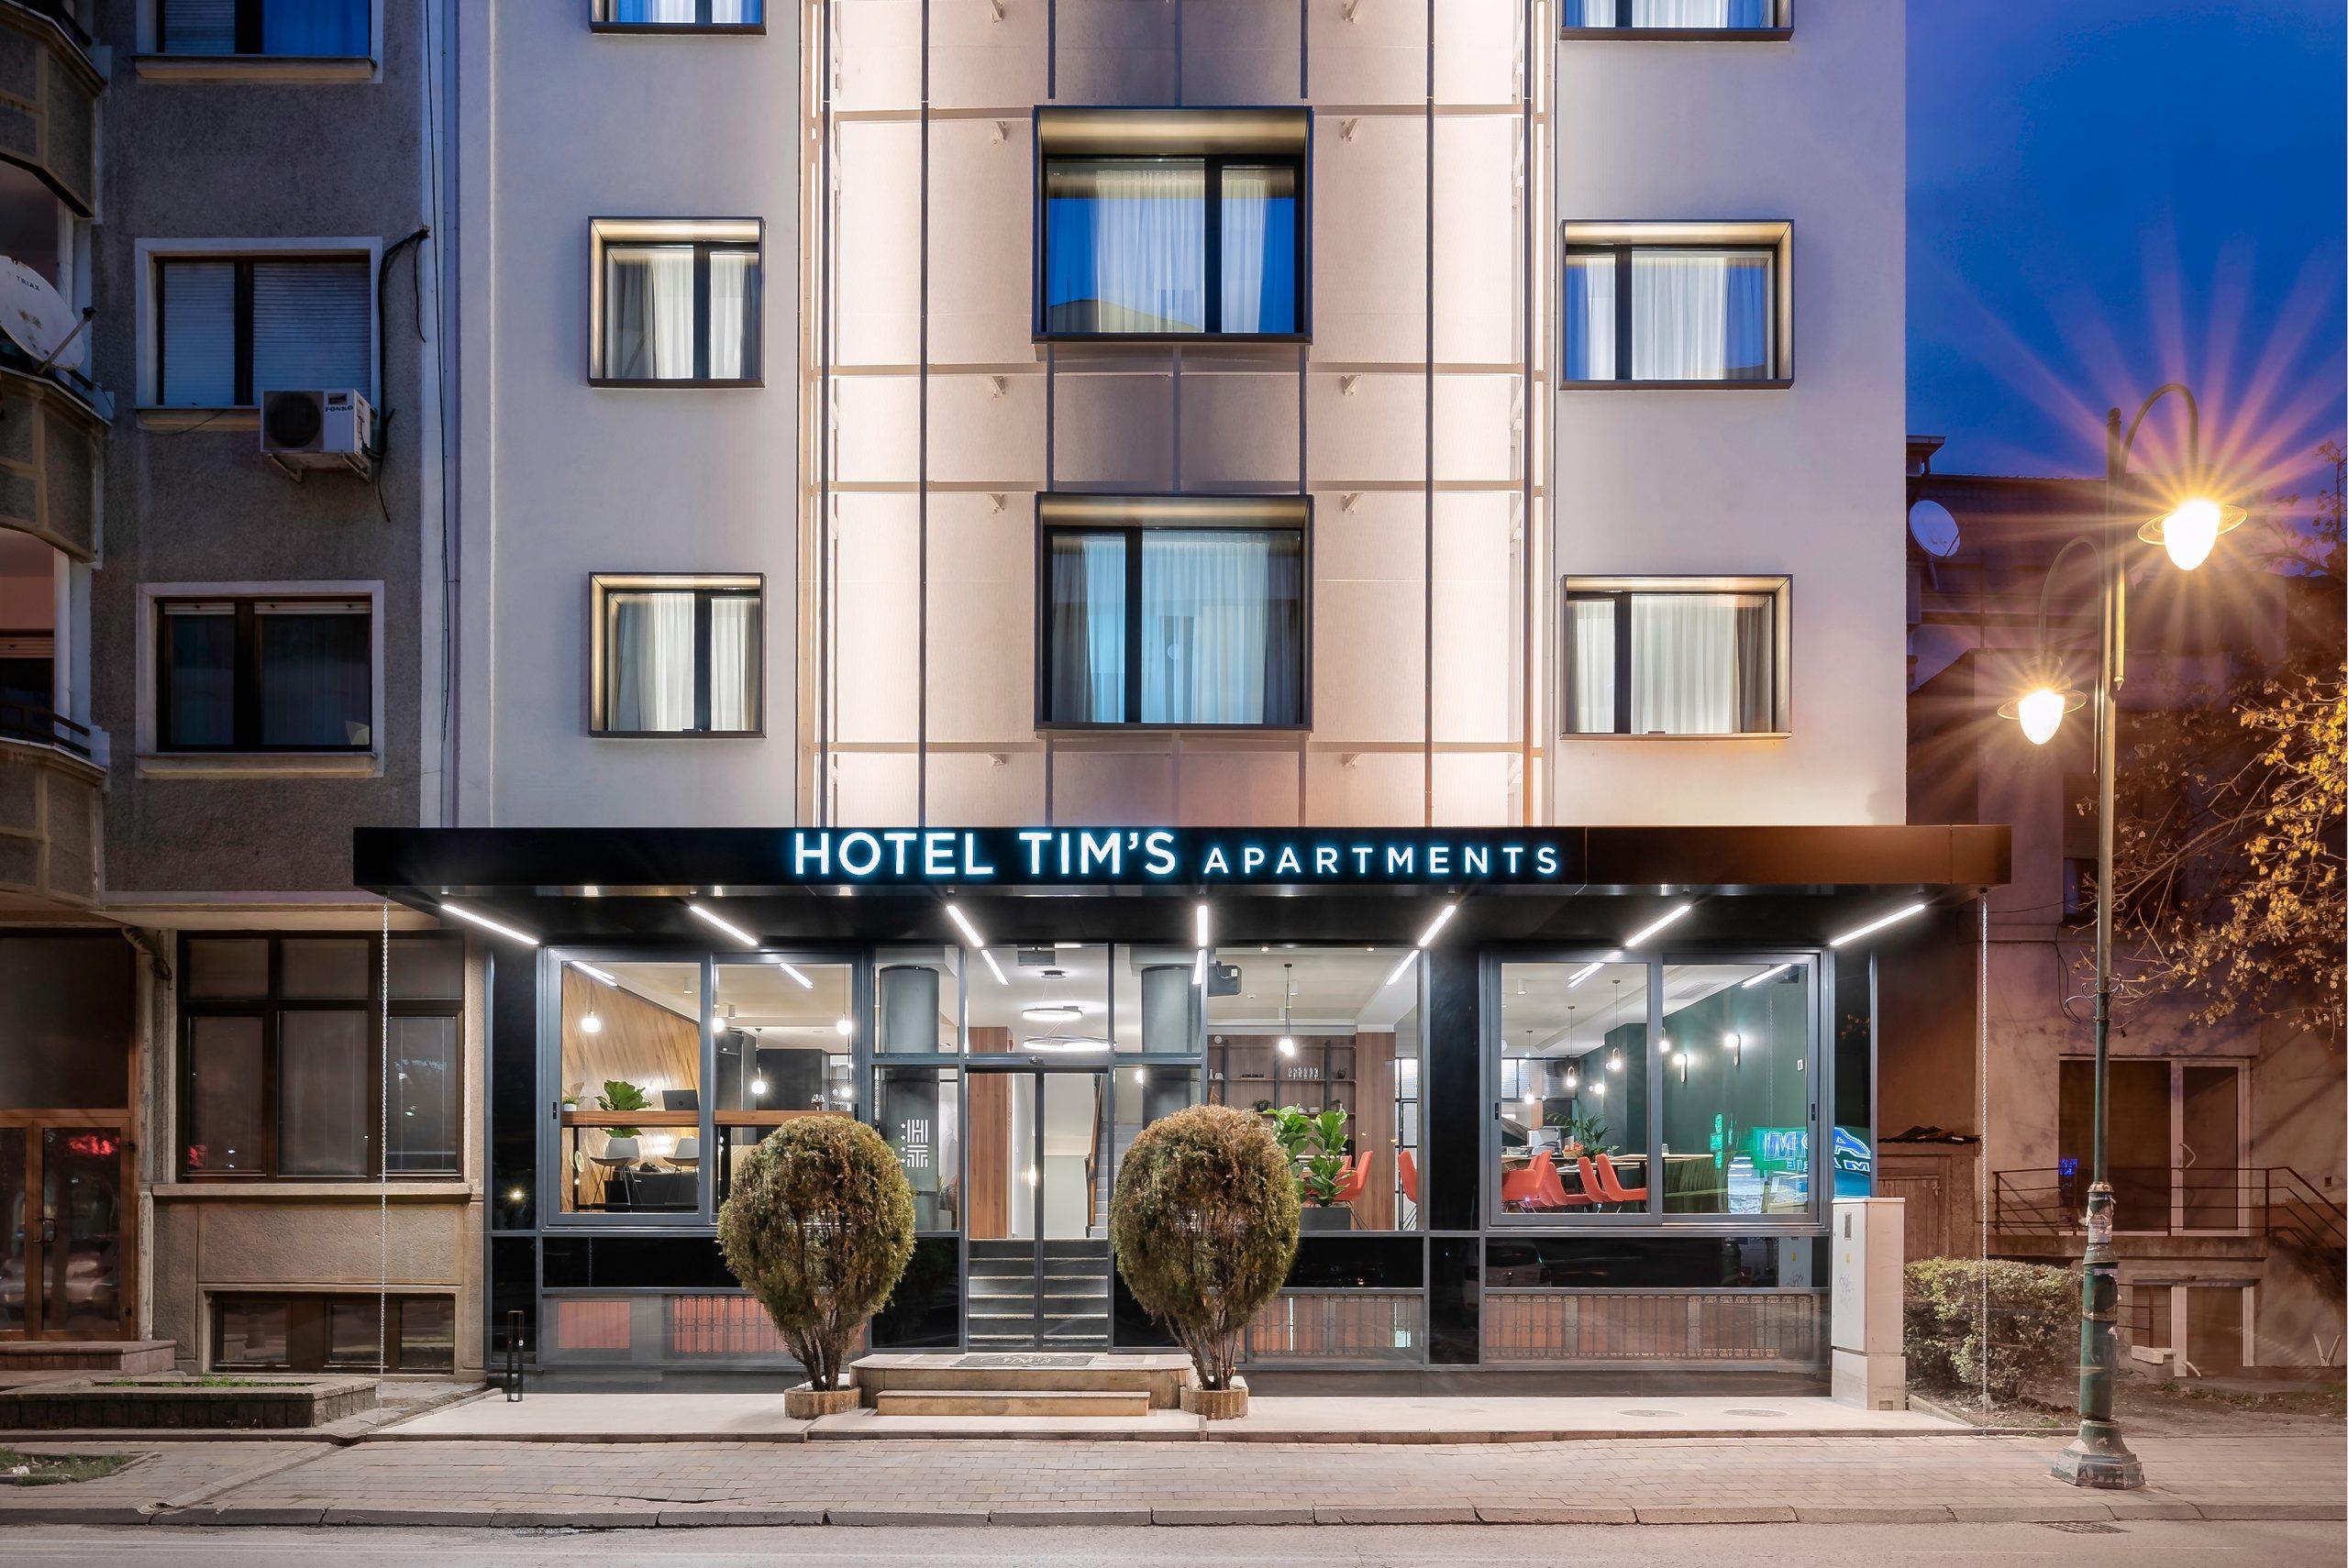 Hotel Tim's Facade